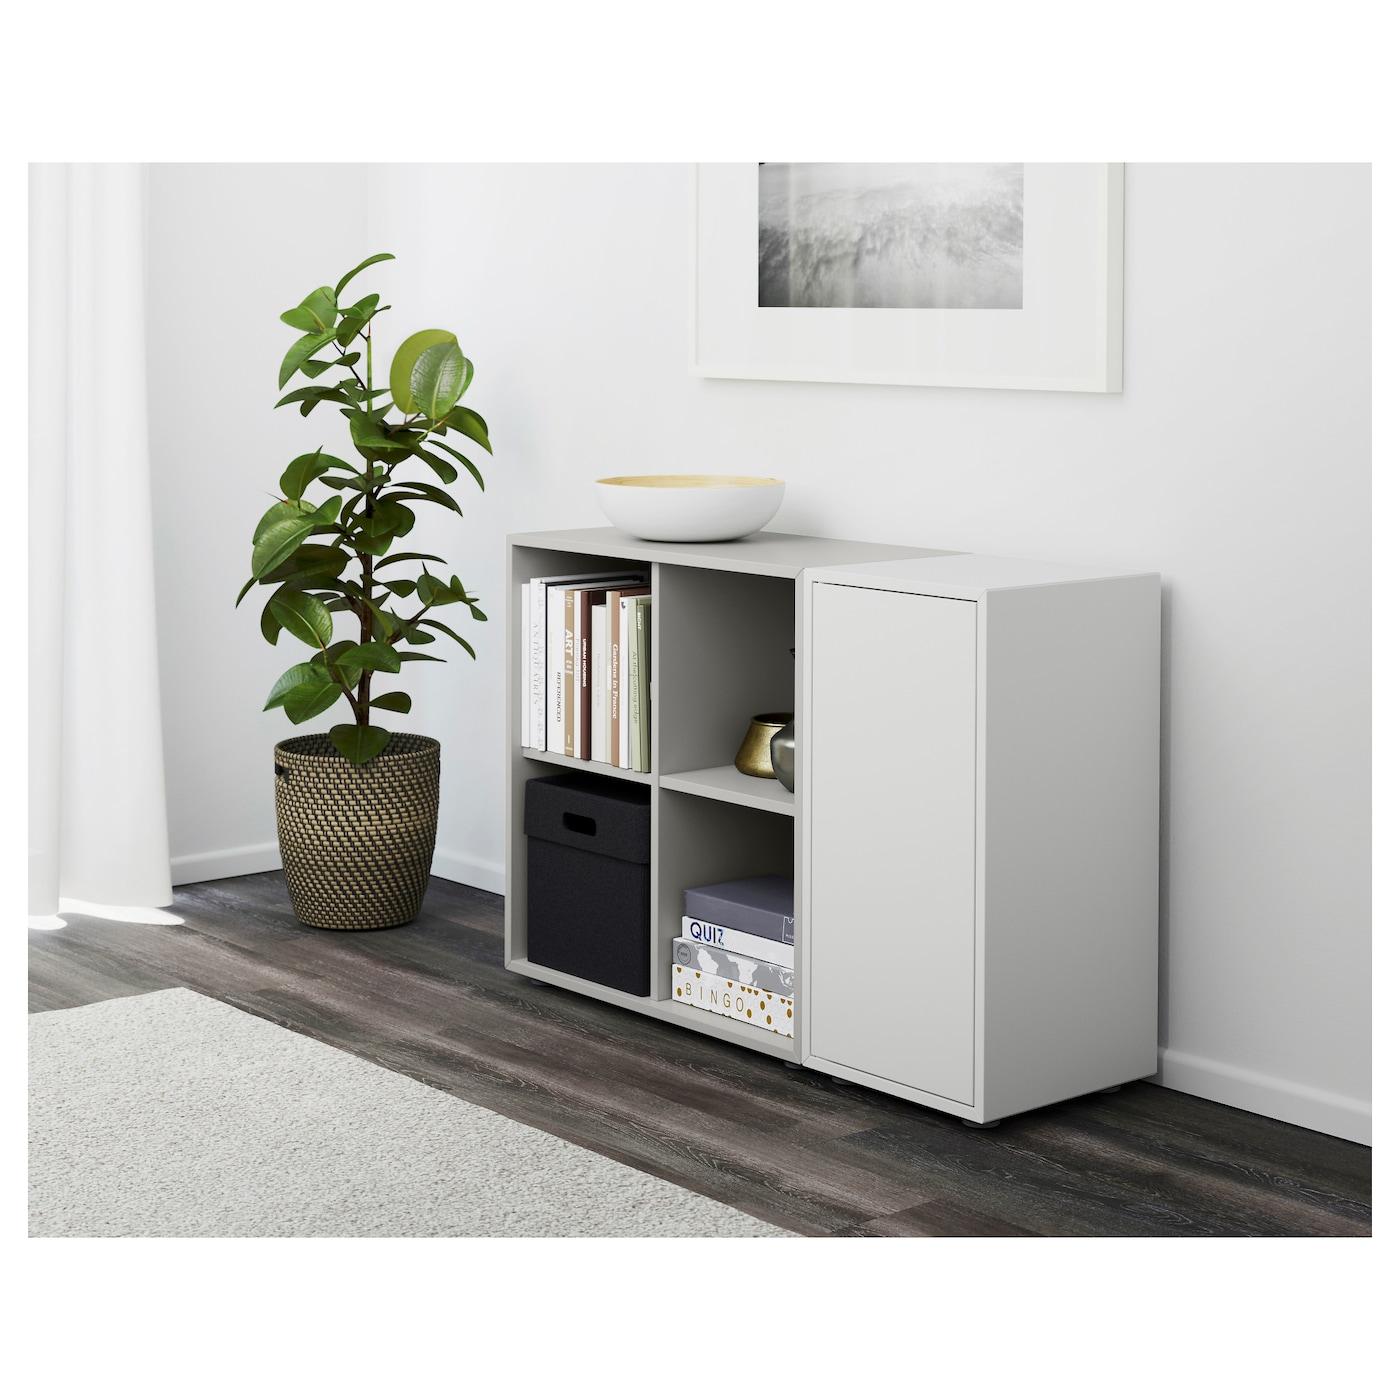 eket cabinet combination with feet white light grey 105 x 35 x 72 cm ikea. Black Bedroom Furniture Sets. Home Design Ideas